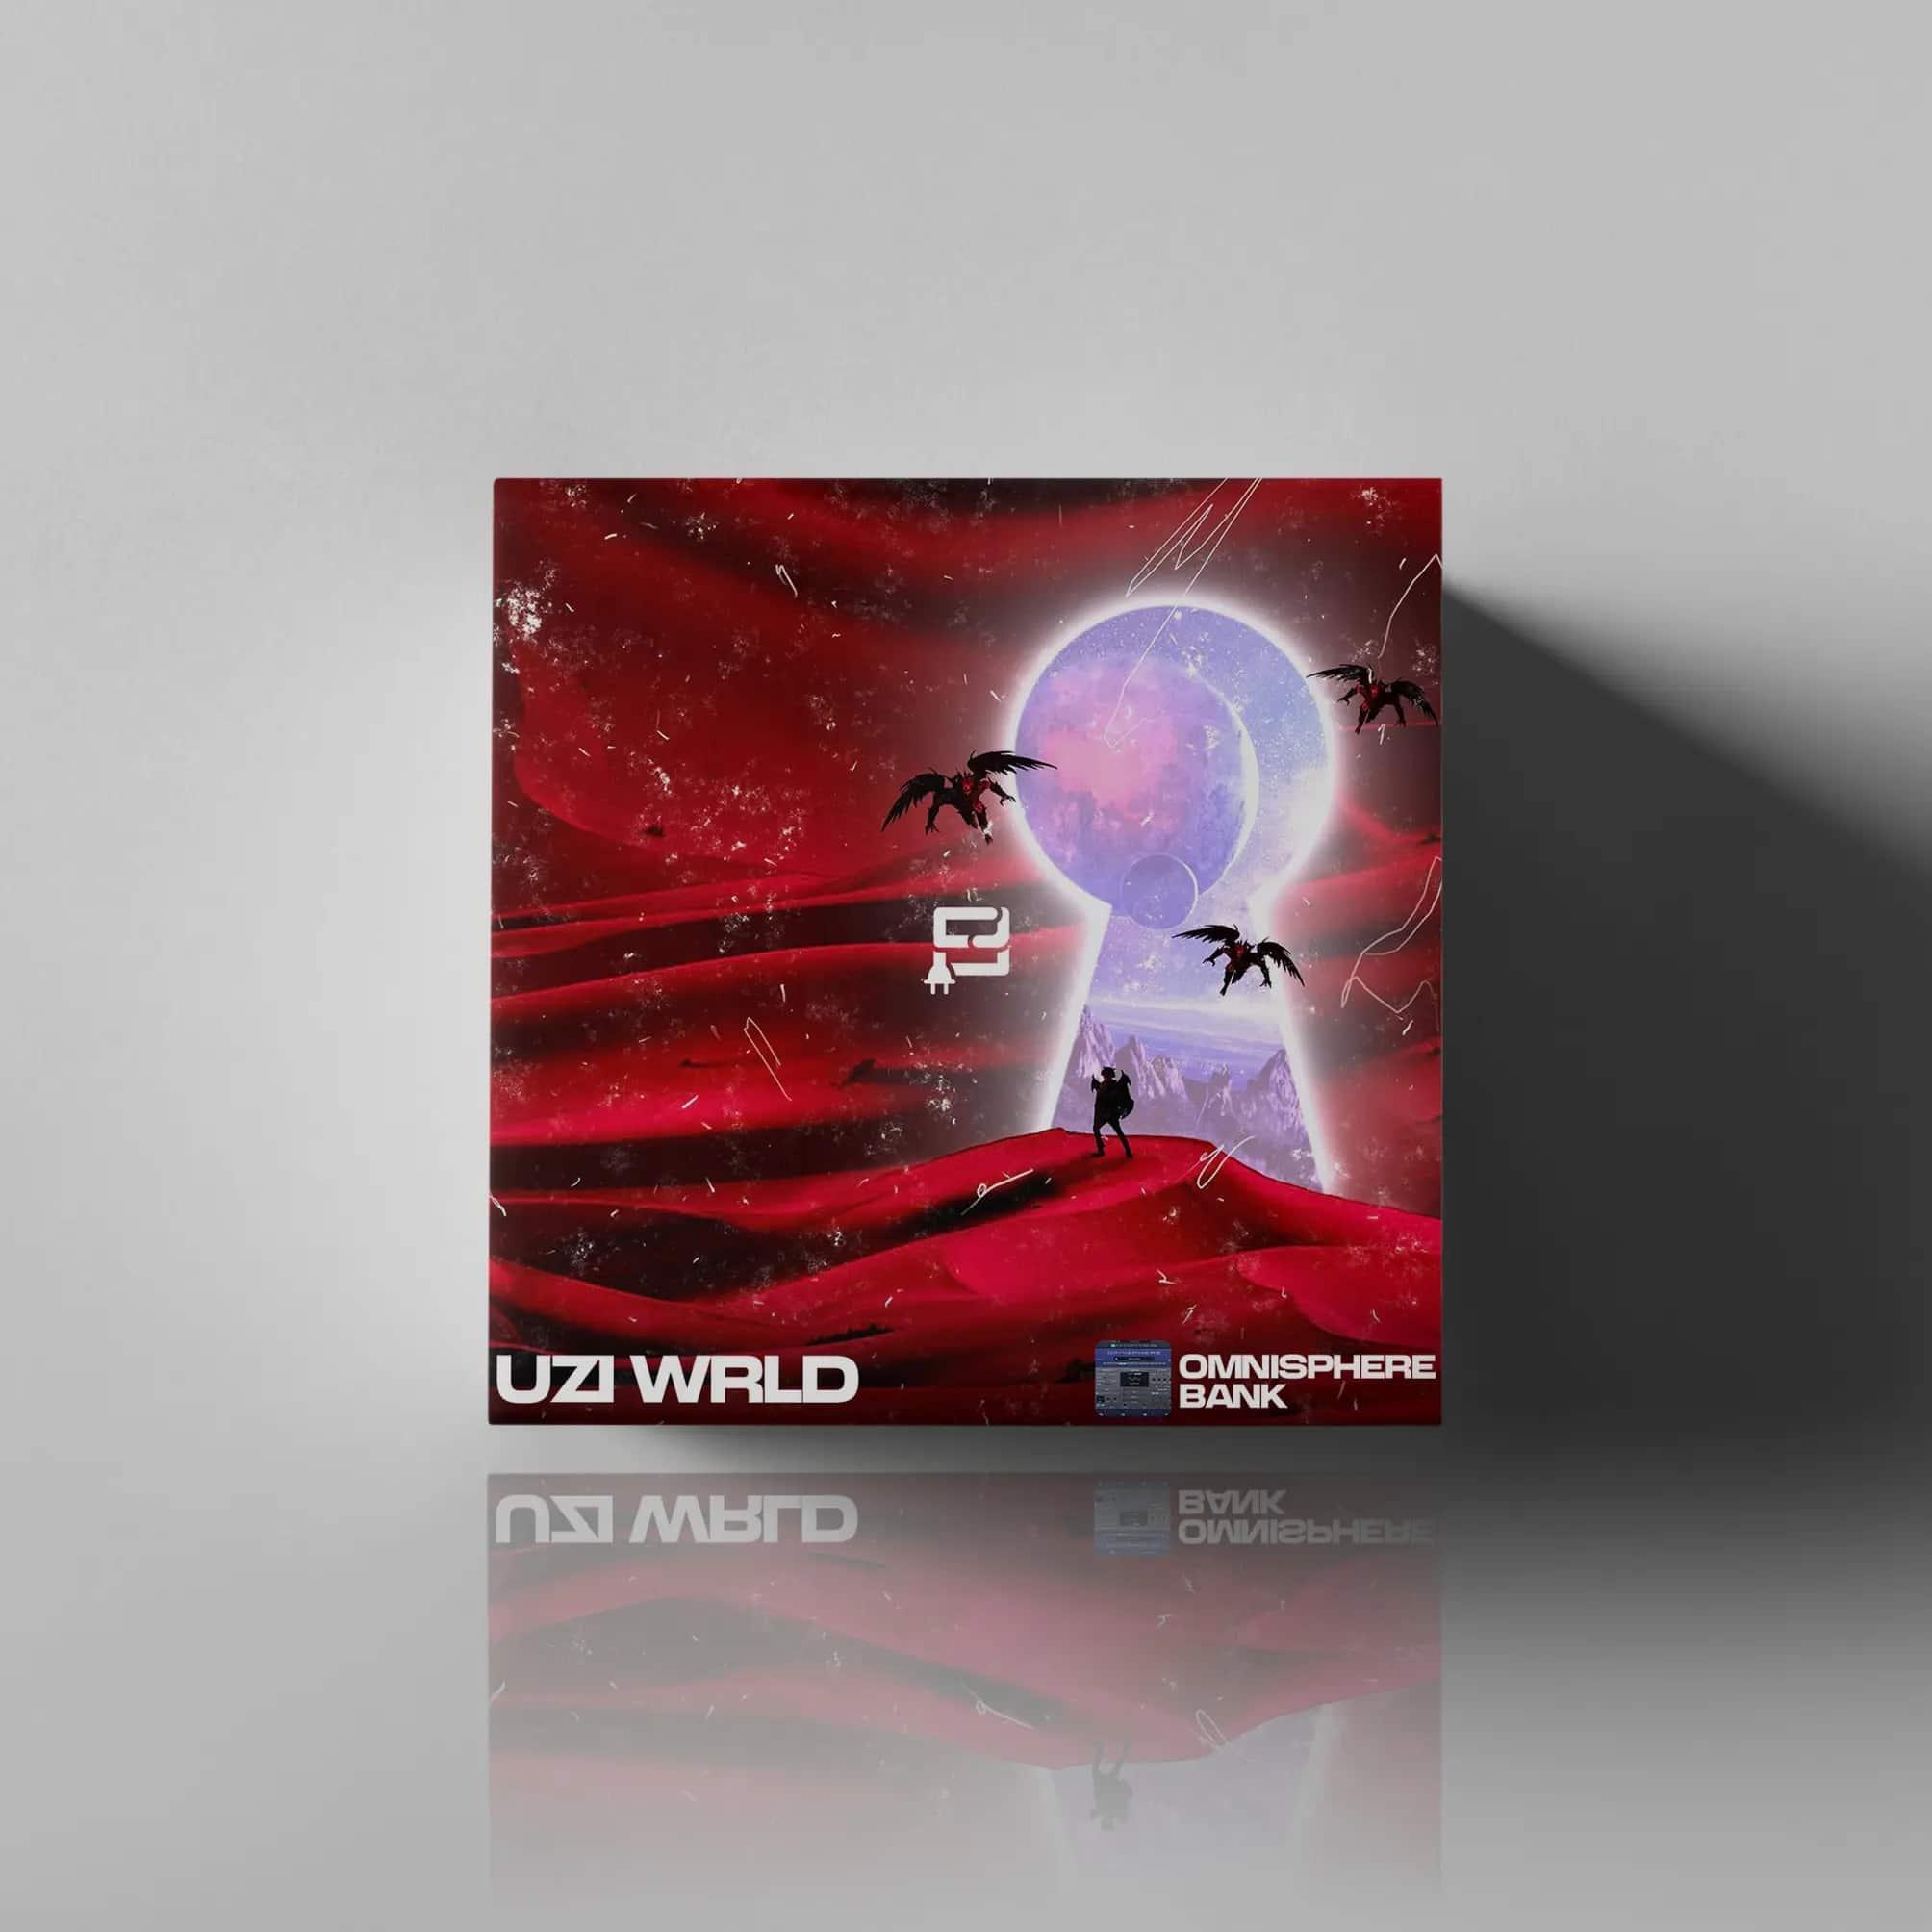 StudioPlug – Uzi Wrld (Omnisphere Bank)